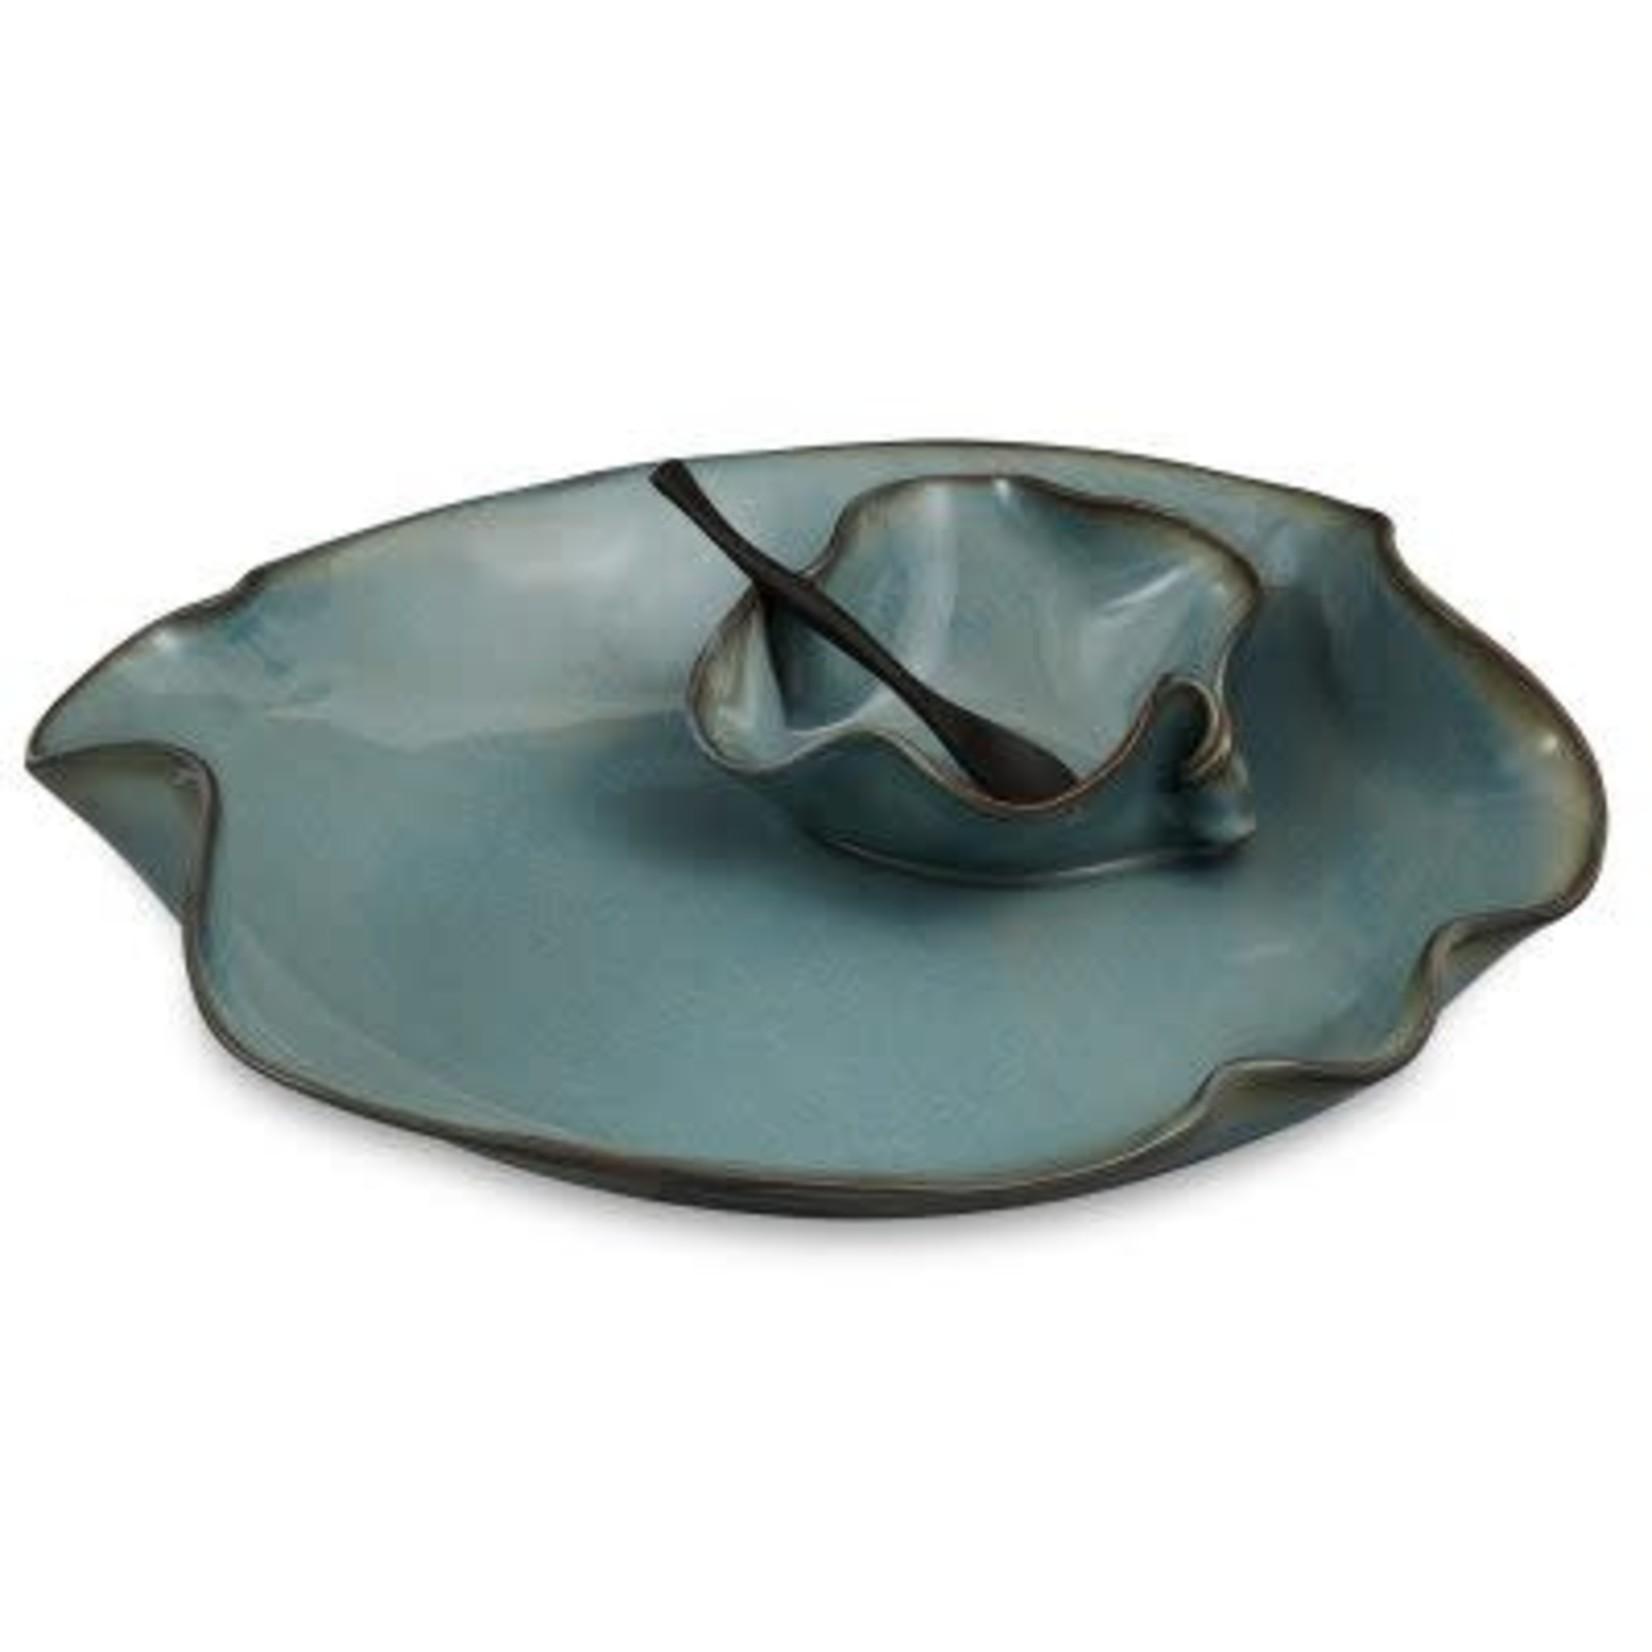 Hilborn Pottery Design Large Dip Set